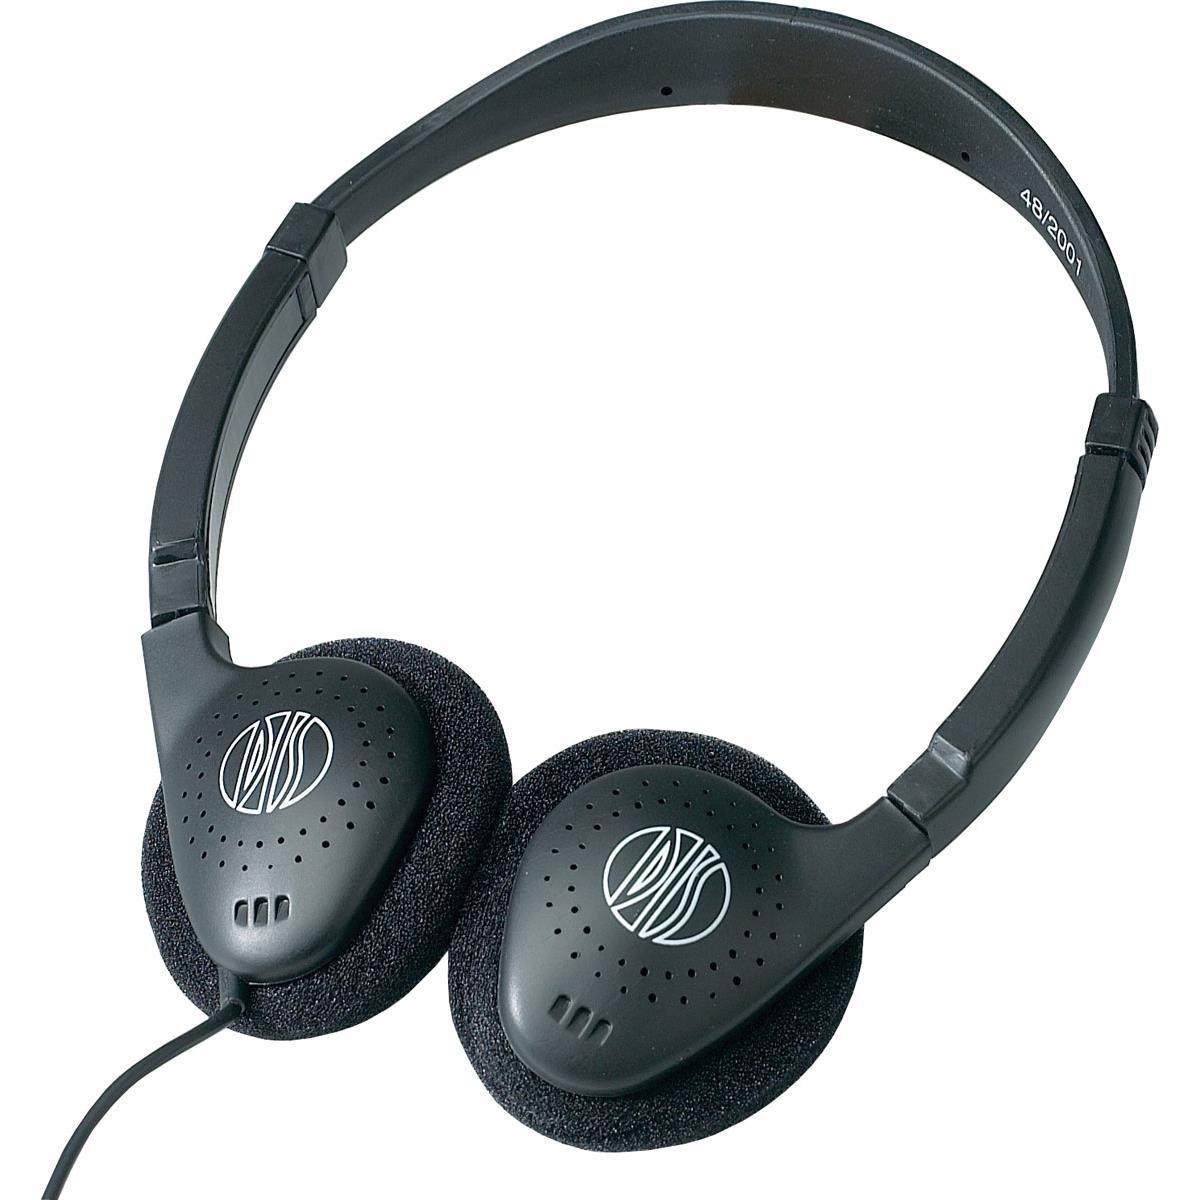 DIS Stereo Headphone f.u.w. DR 60xx